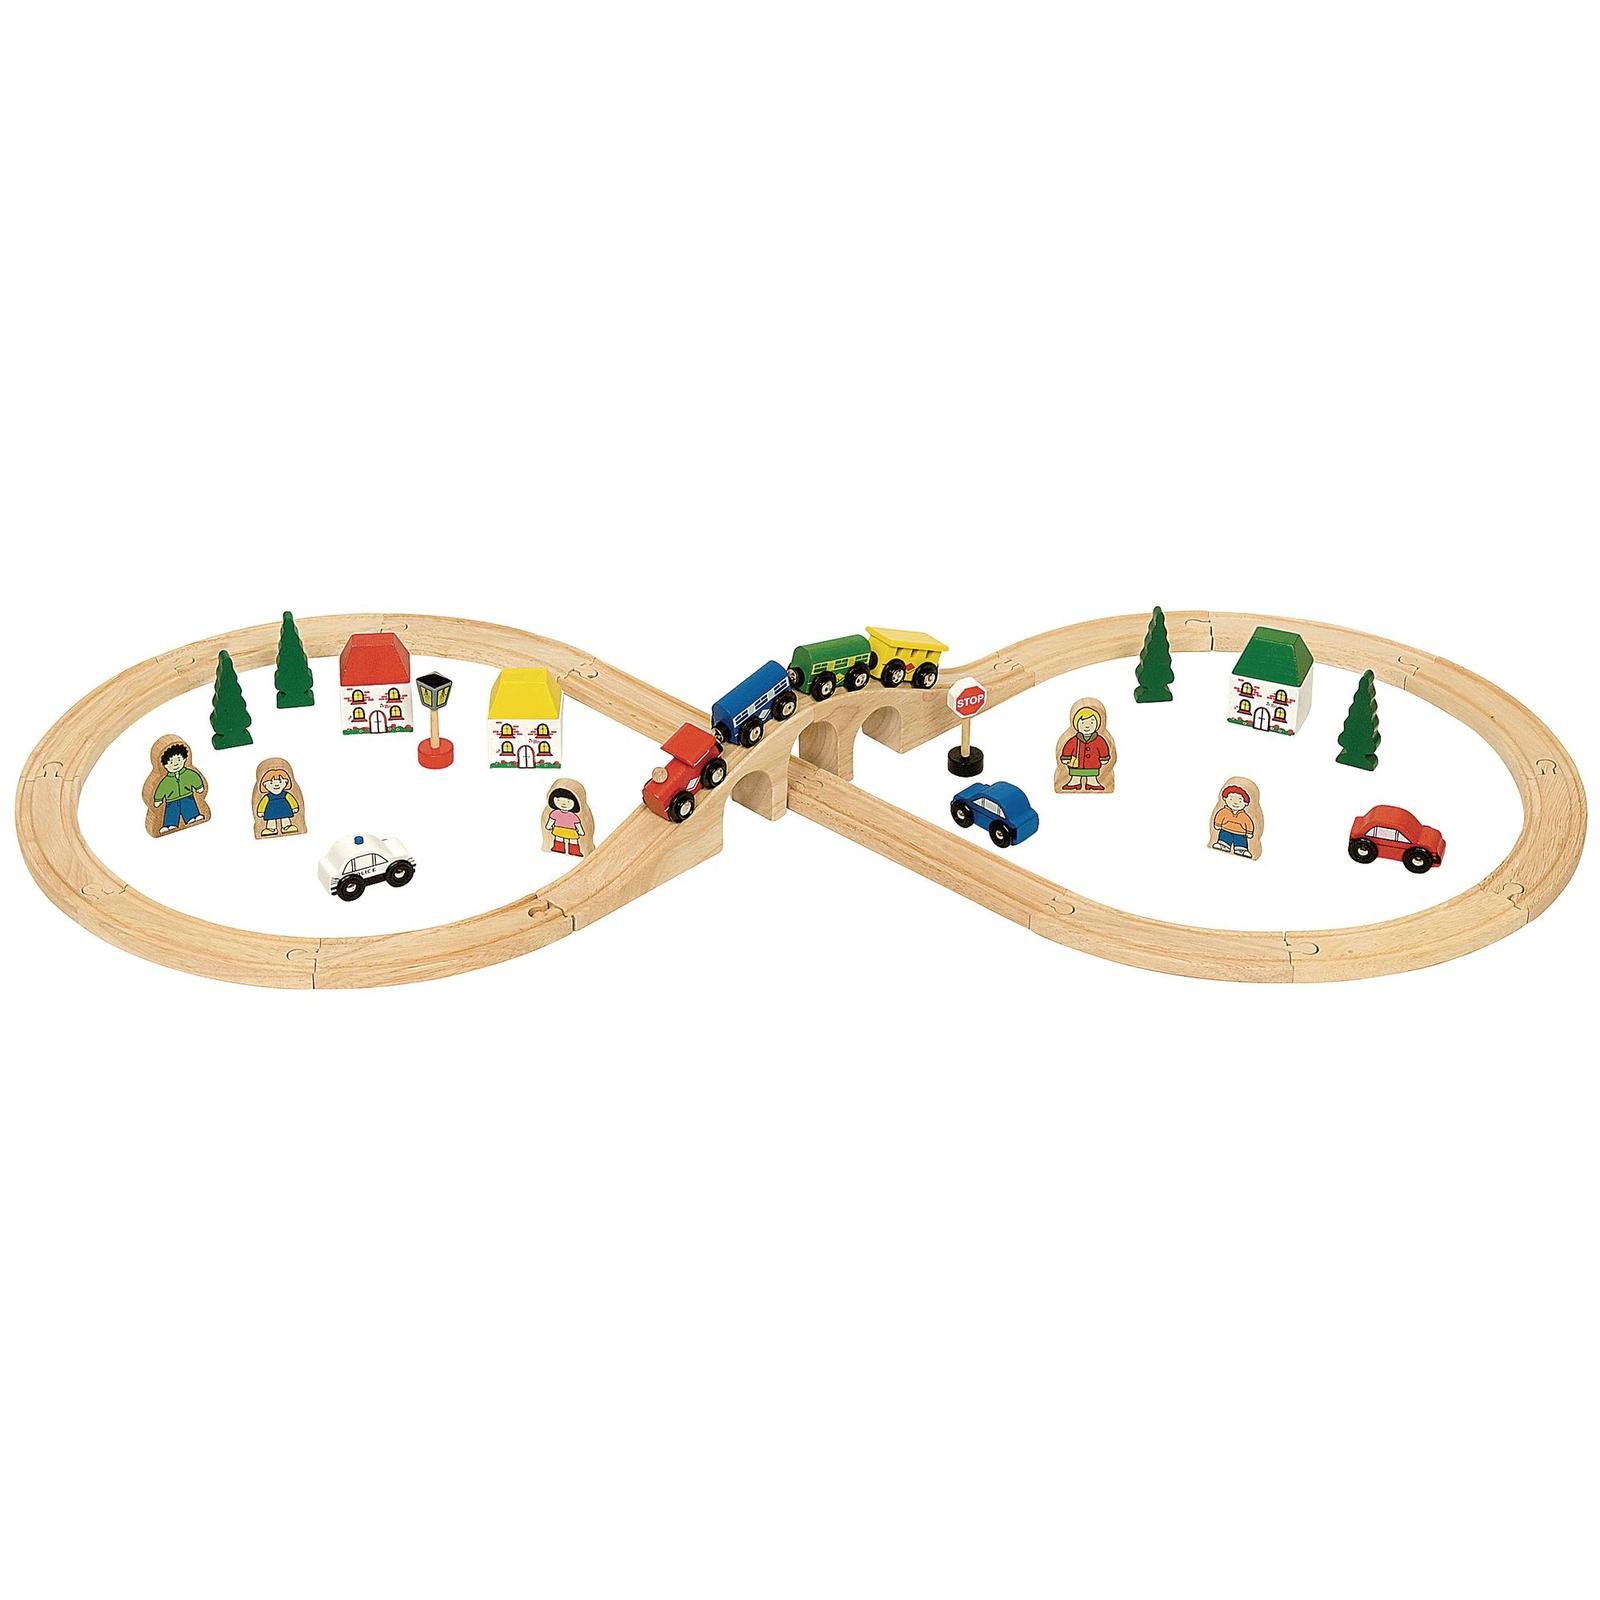 Figure of 8 Train Set